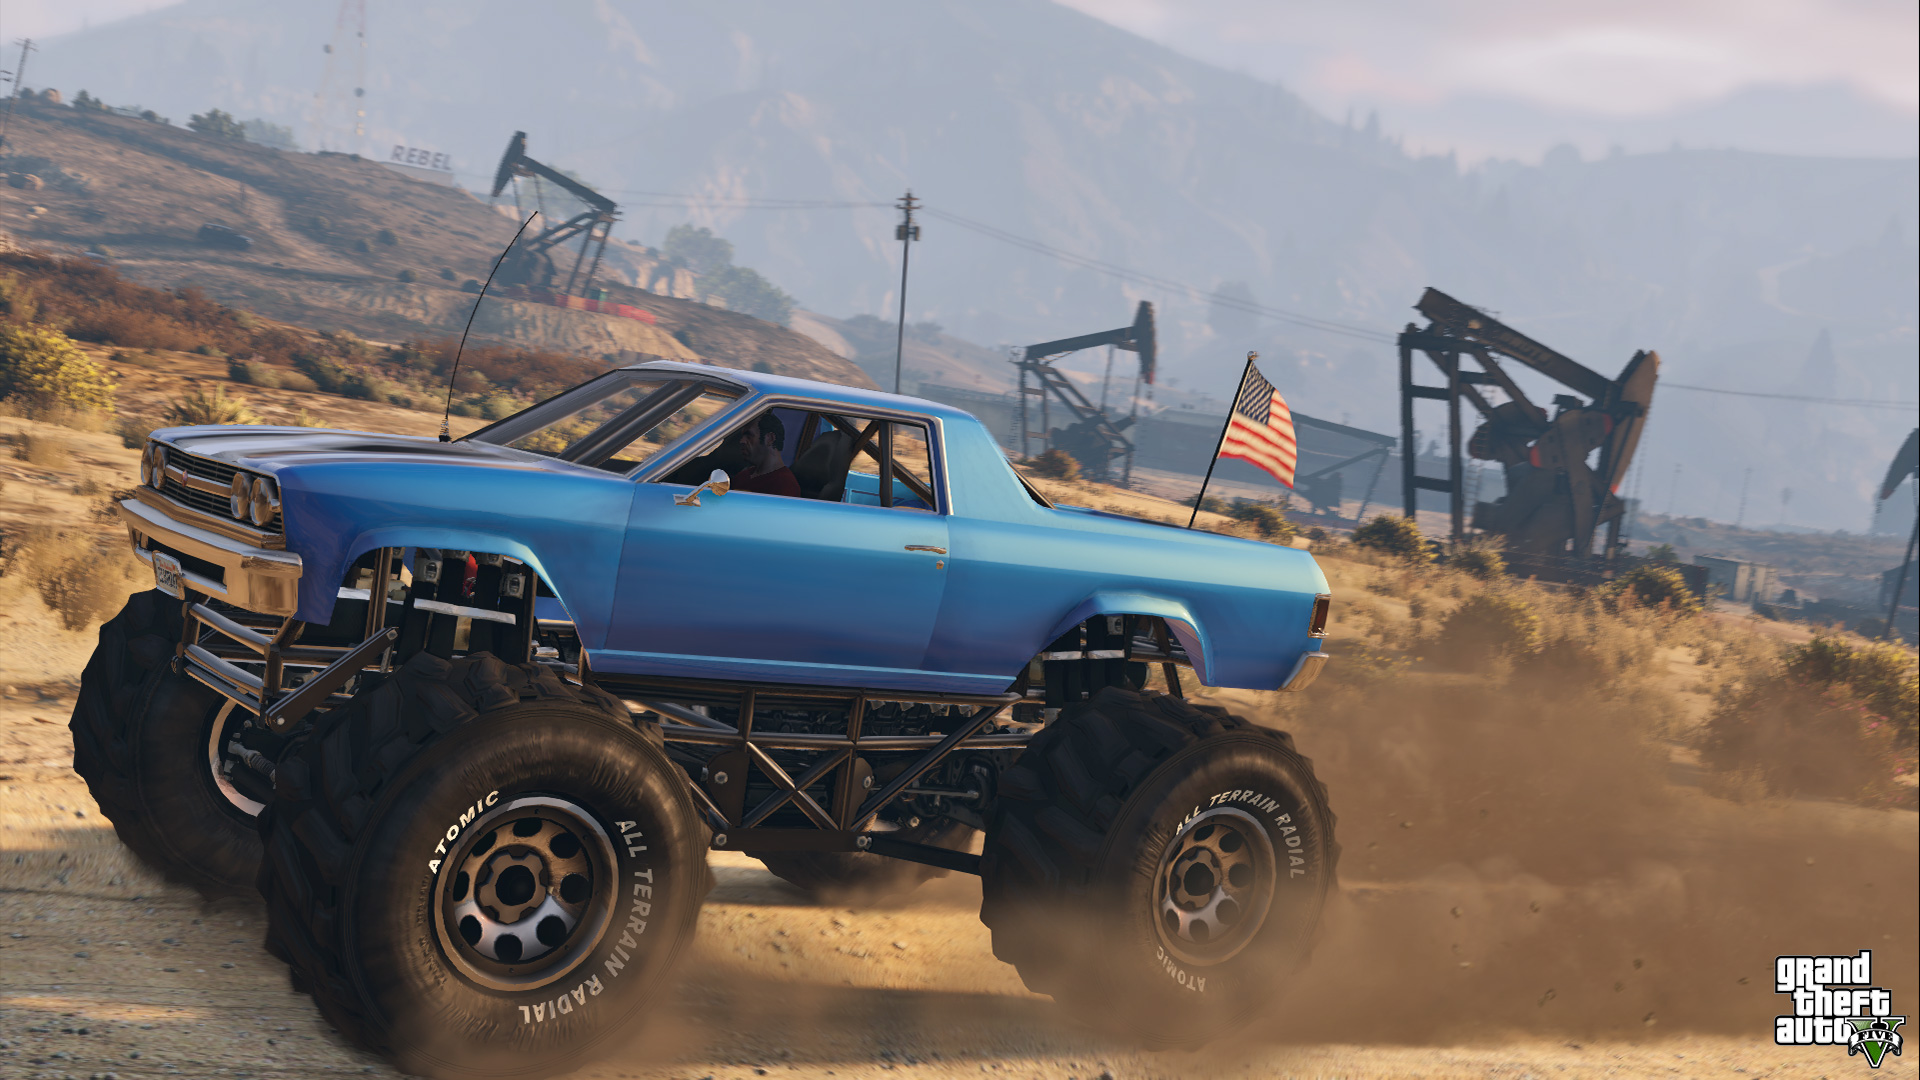 Grand Theft Auto V For Next Gen Consoles Hits Stores Nov 18 1920x1080